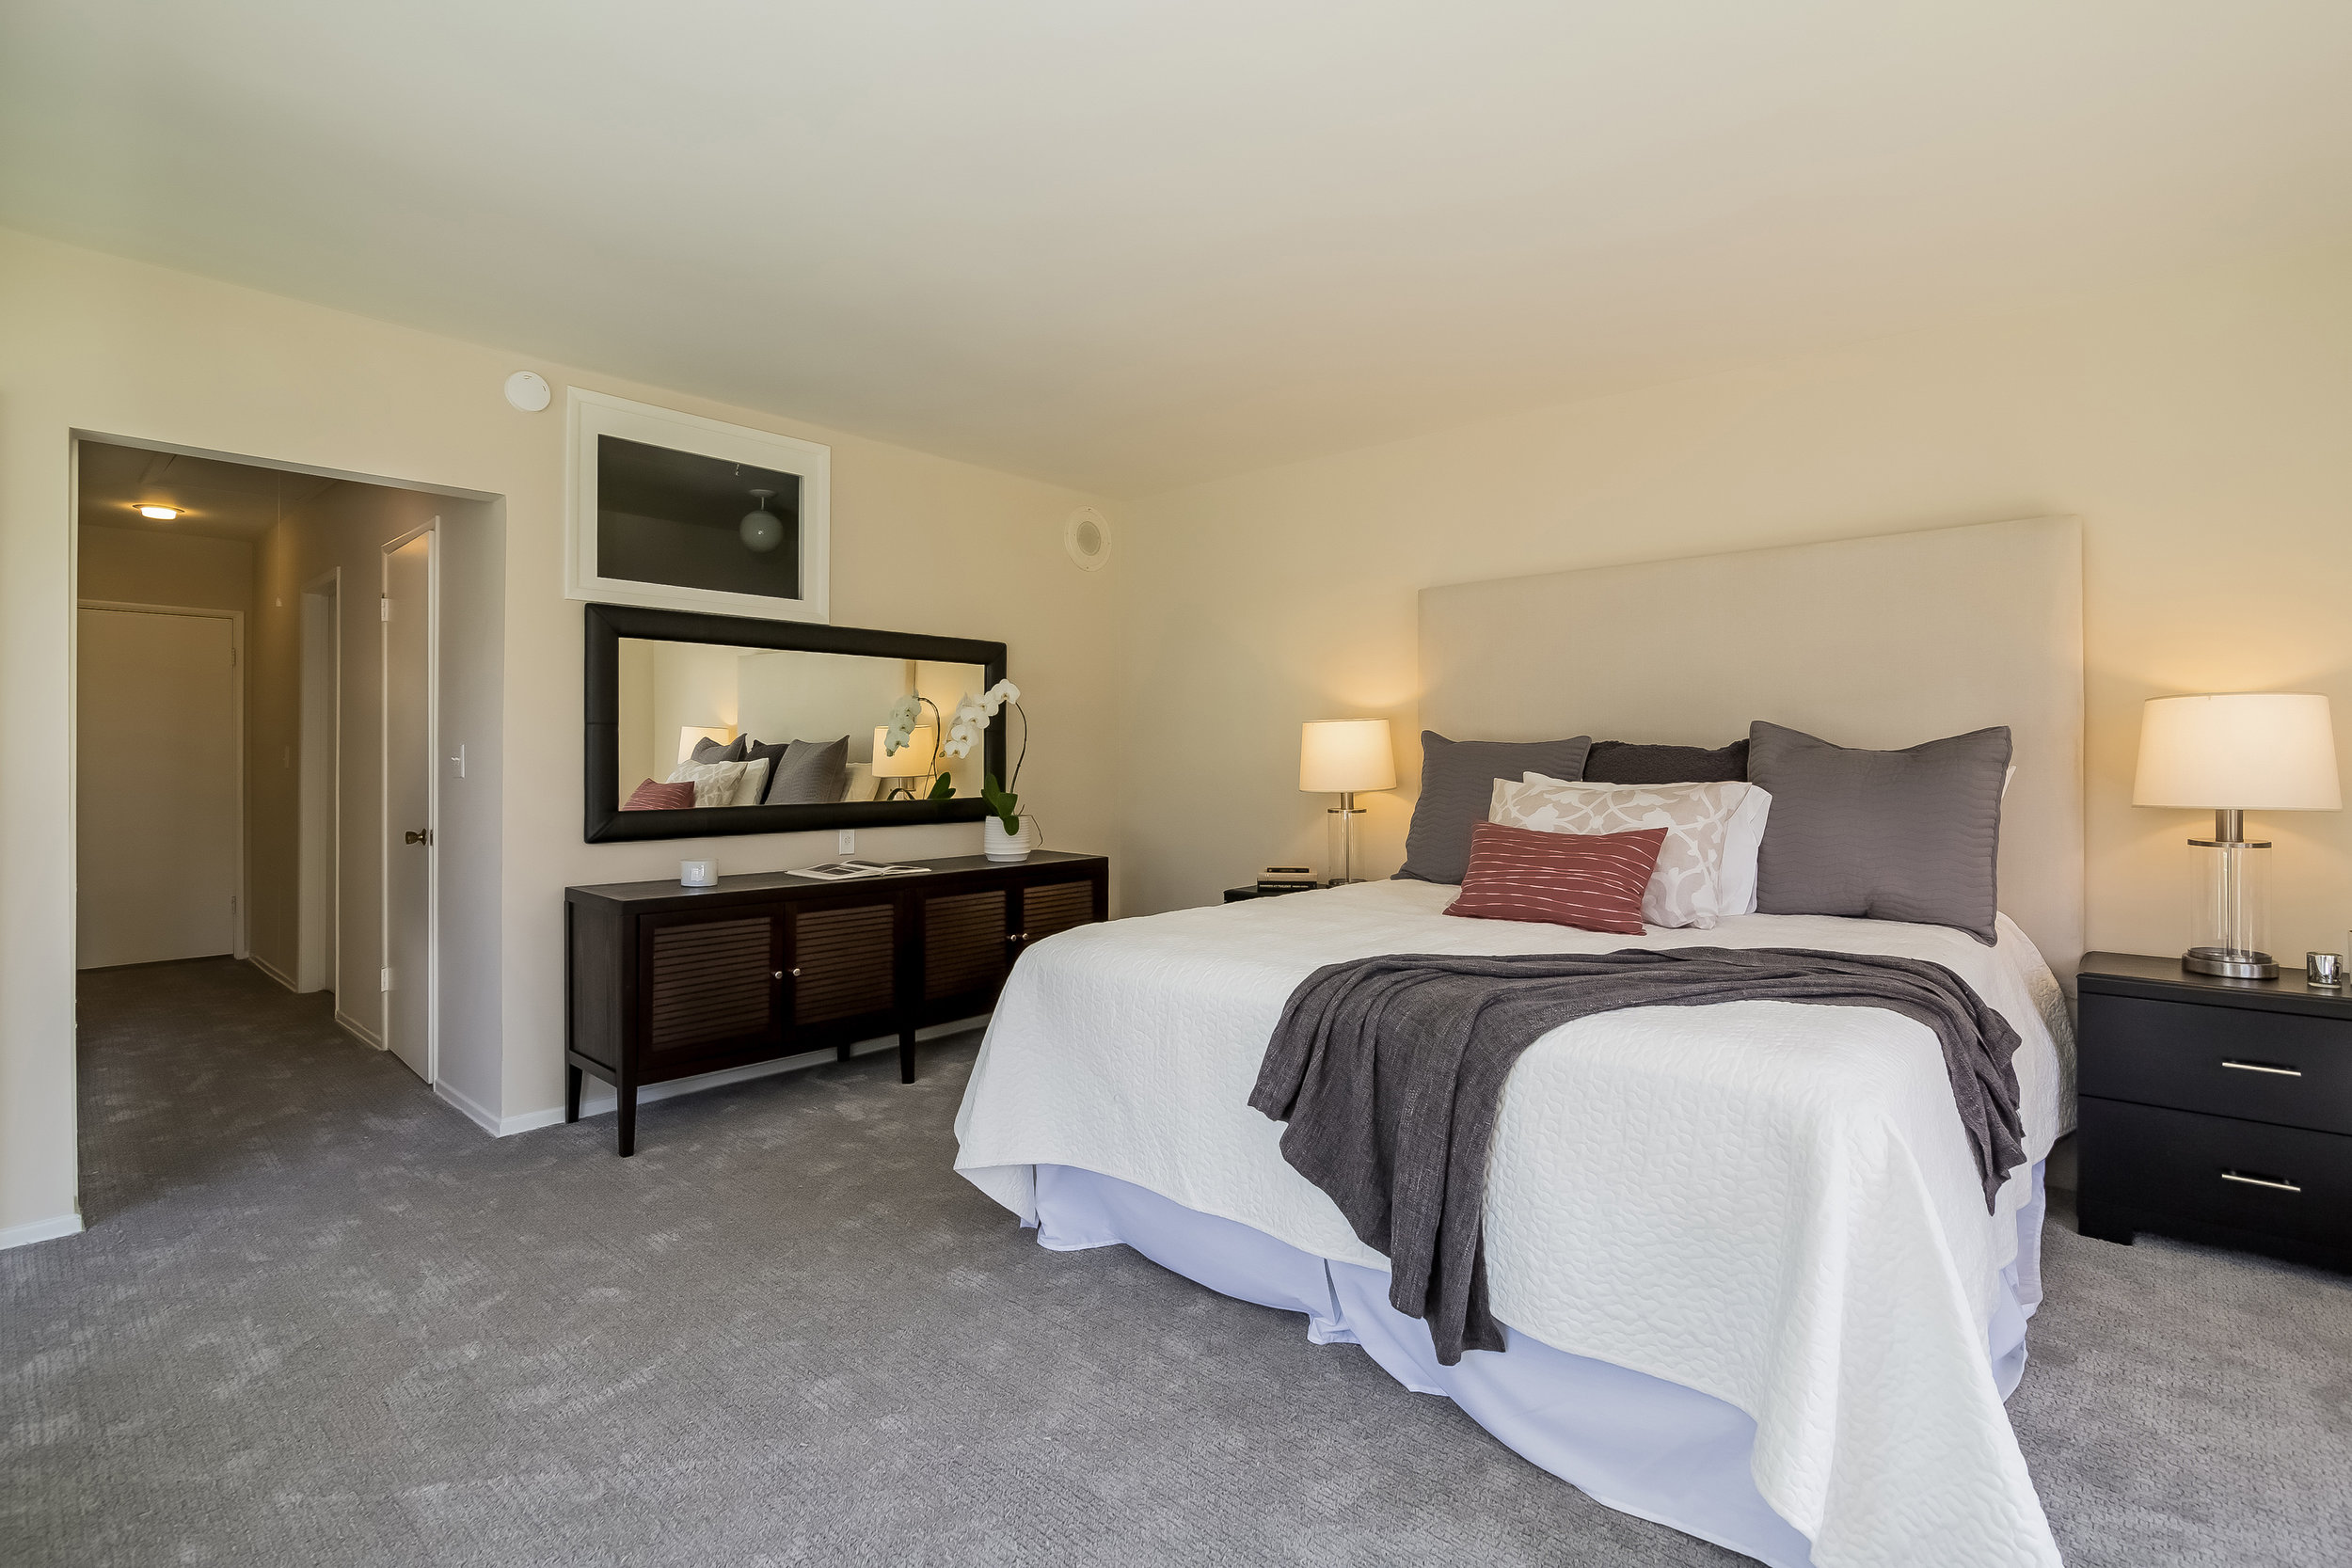 023-Master_Bedroom-2805404-large copy.jpg